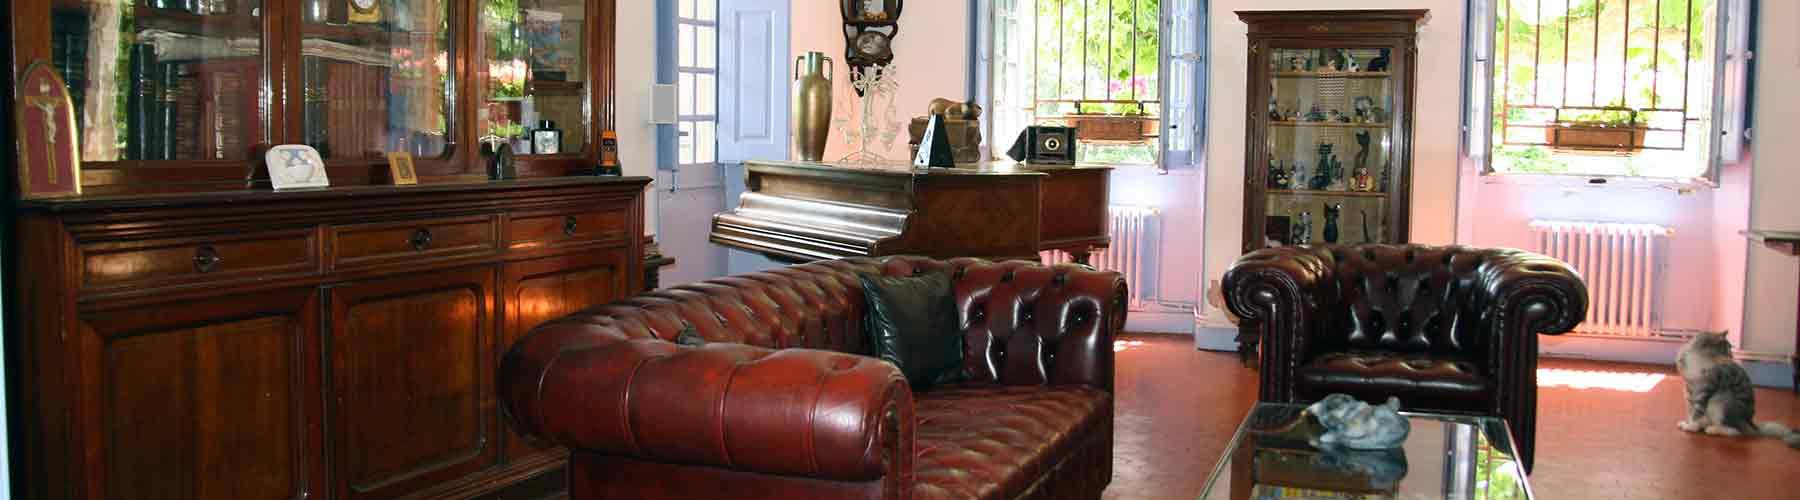 Salons billard chambre d 39 hotes television provence for Chambre d hotes salon de provence